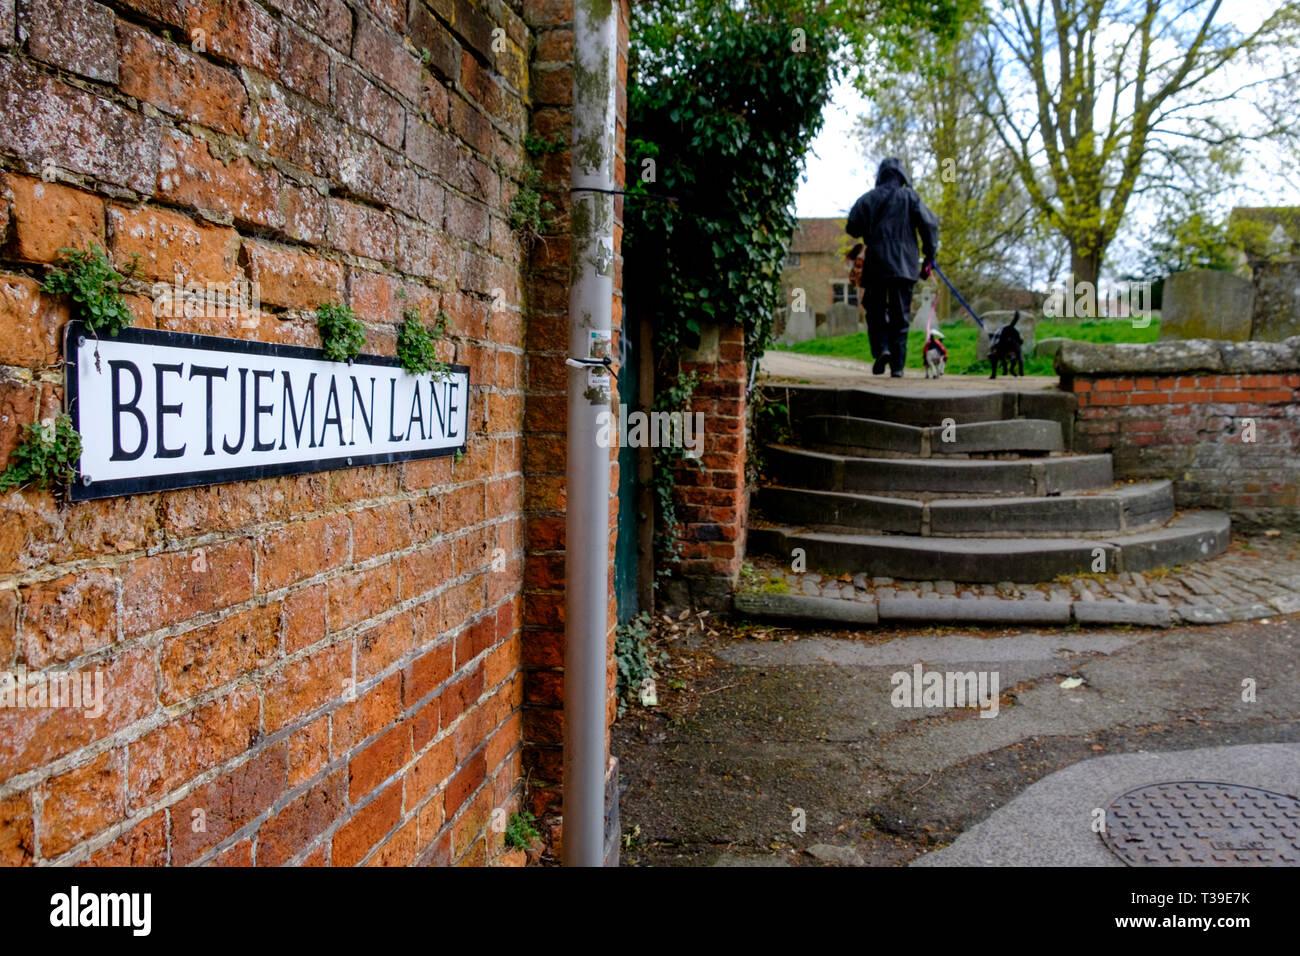 Around Wantage a market town in Oxfordshire England UK Betjeman Lane - Stock Image